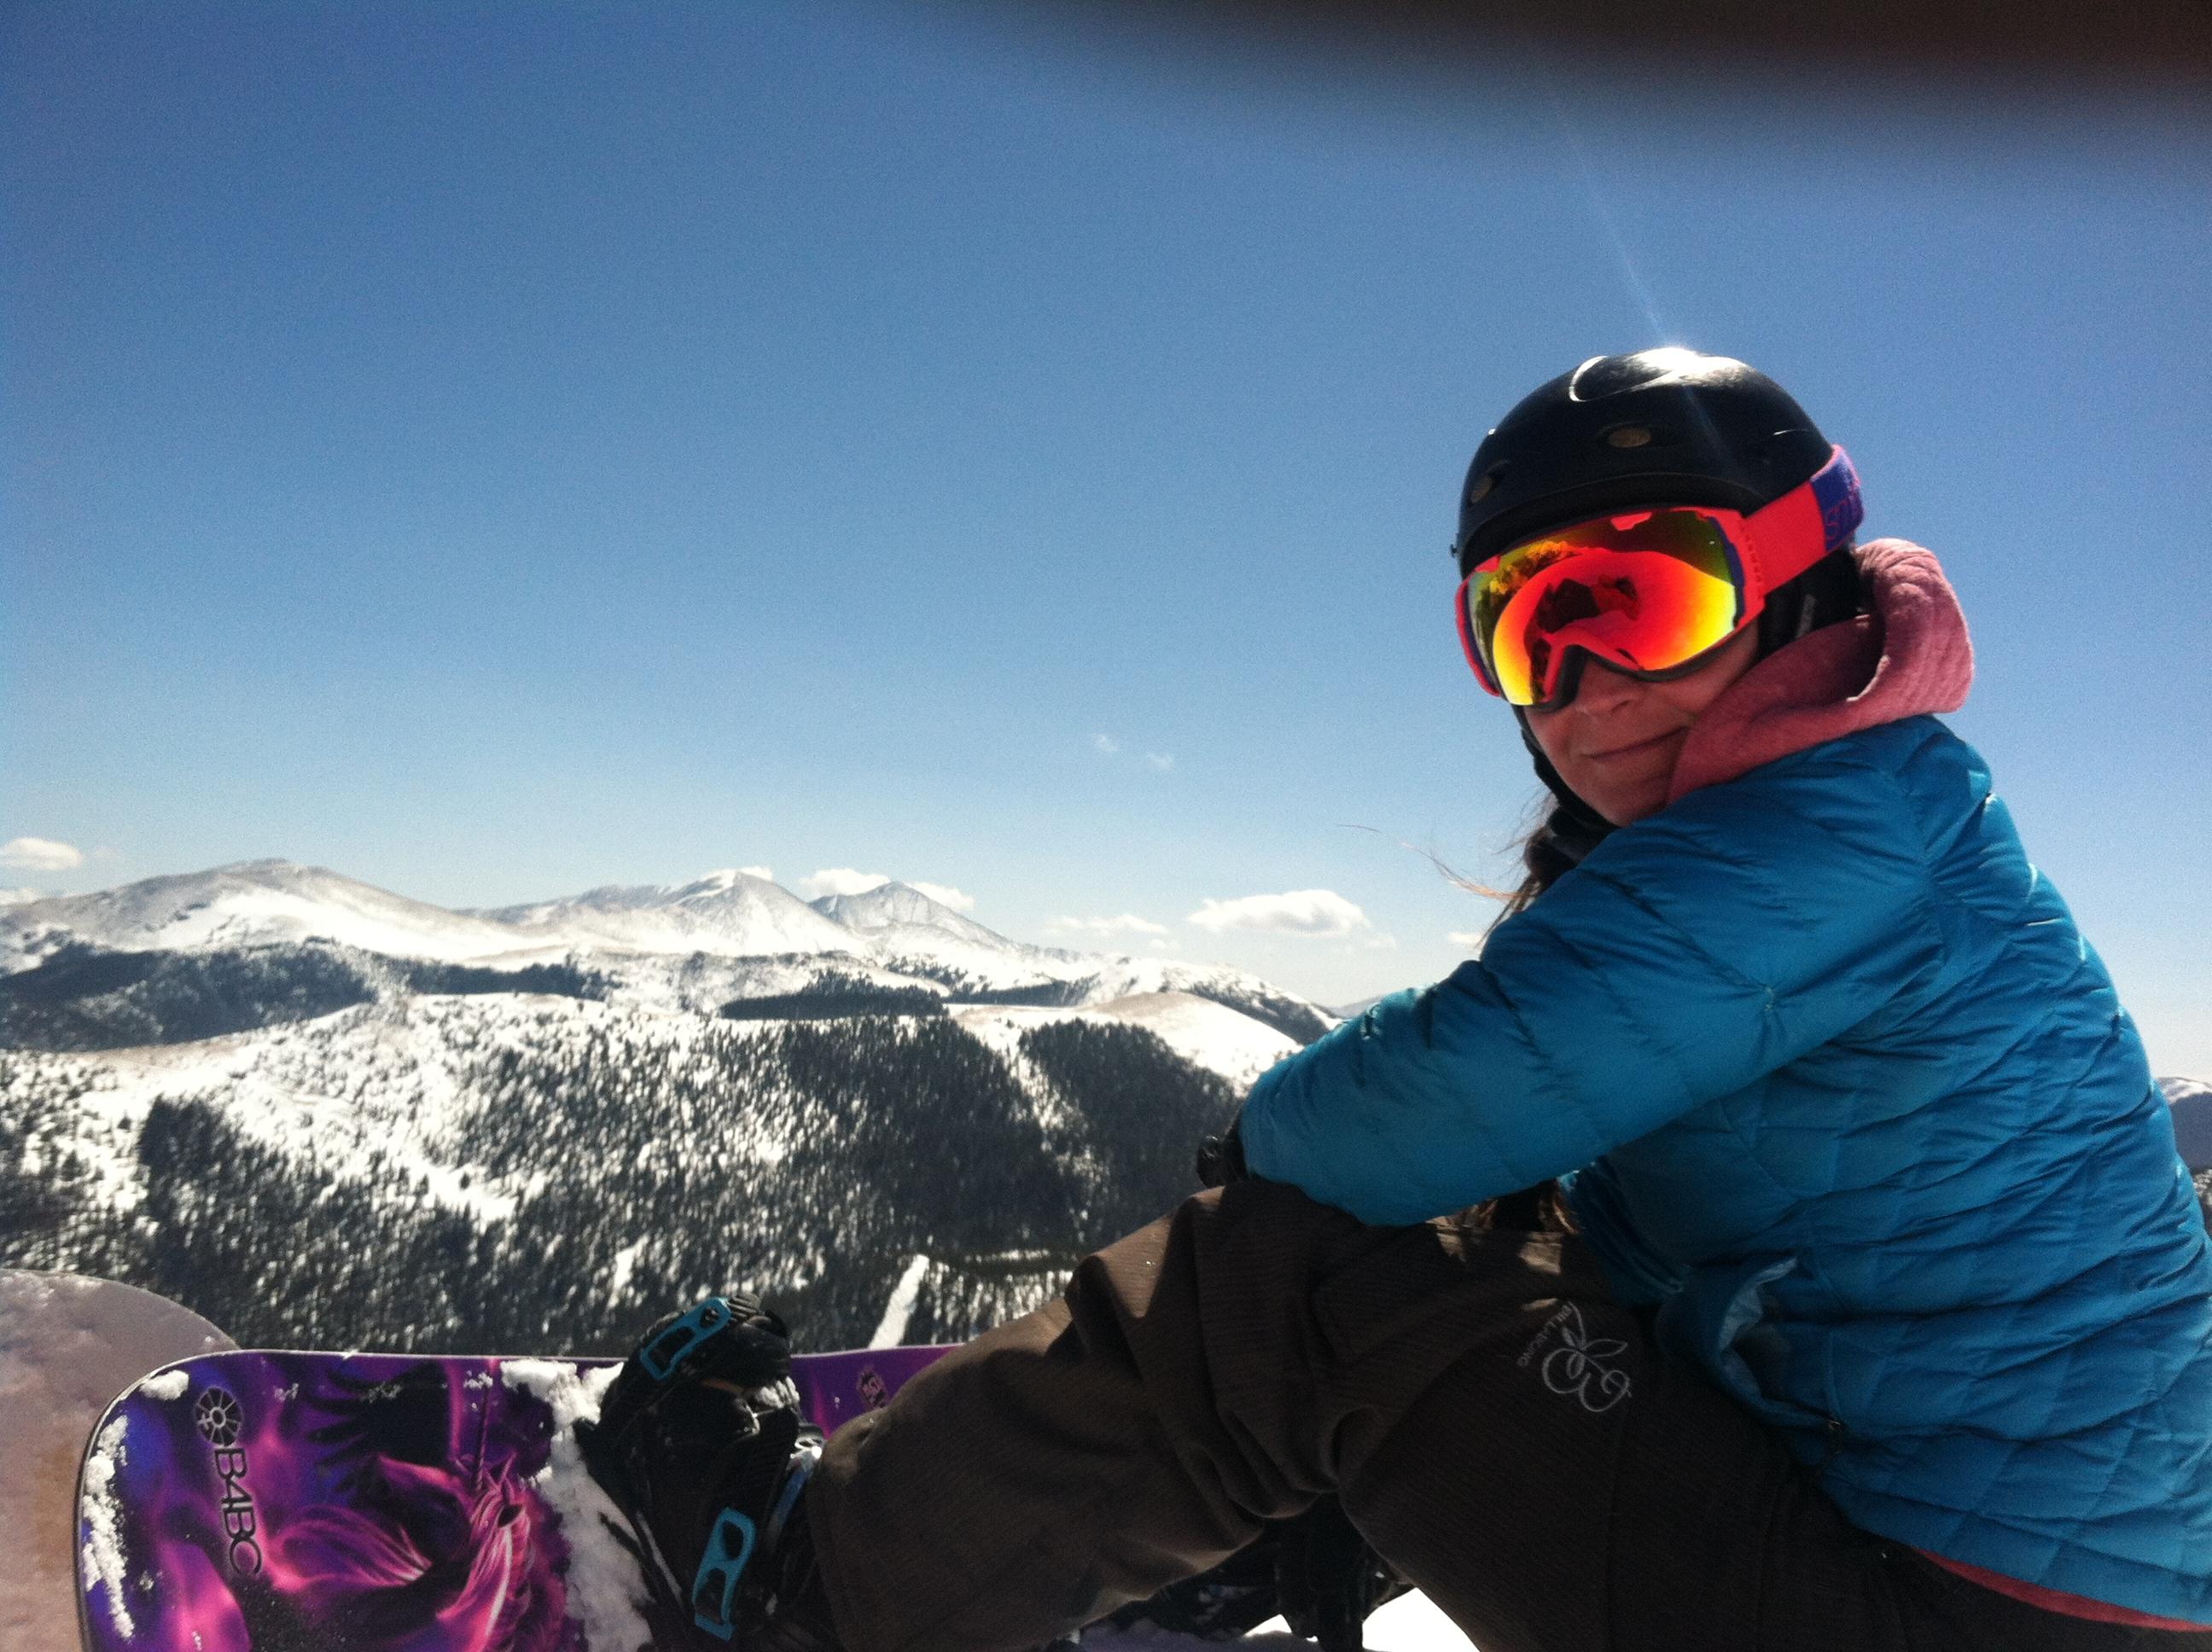 Snowboard the peaks!